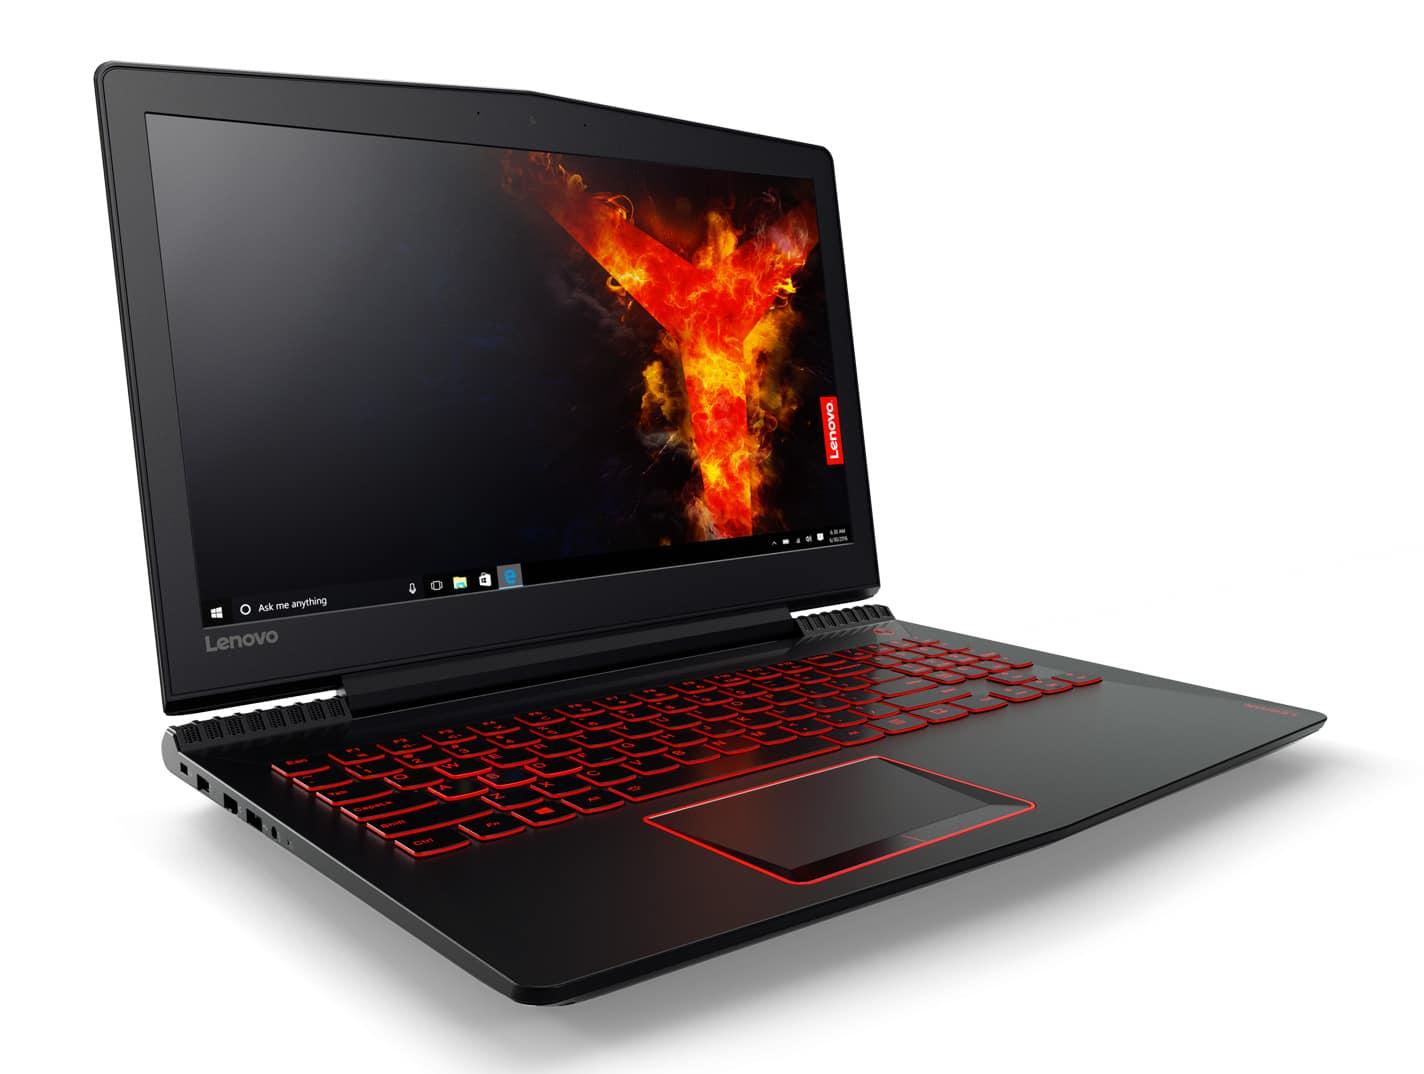 "Lenovo Legion Y520-15IKBN -698 à 799€, PC portable 15"" IPS GTX 1050 Quad"